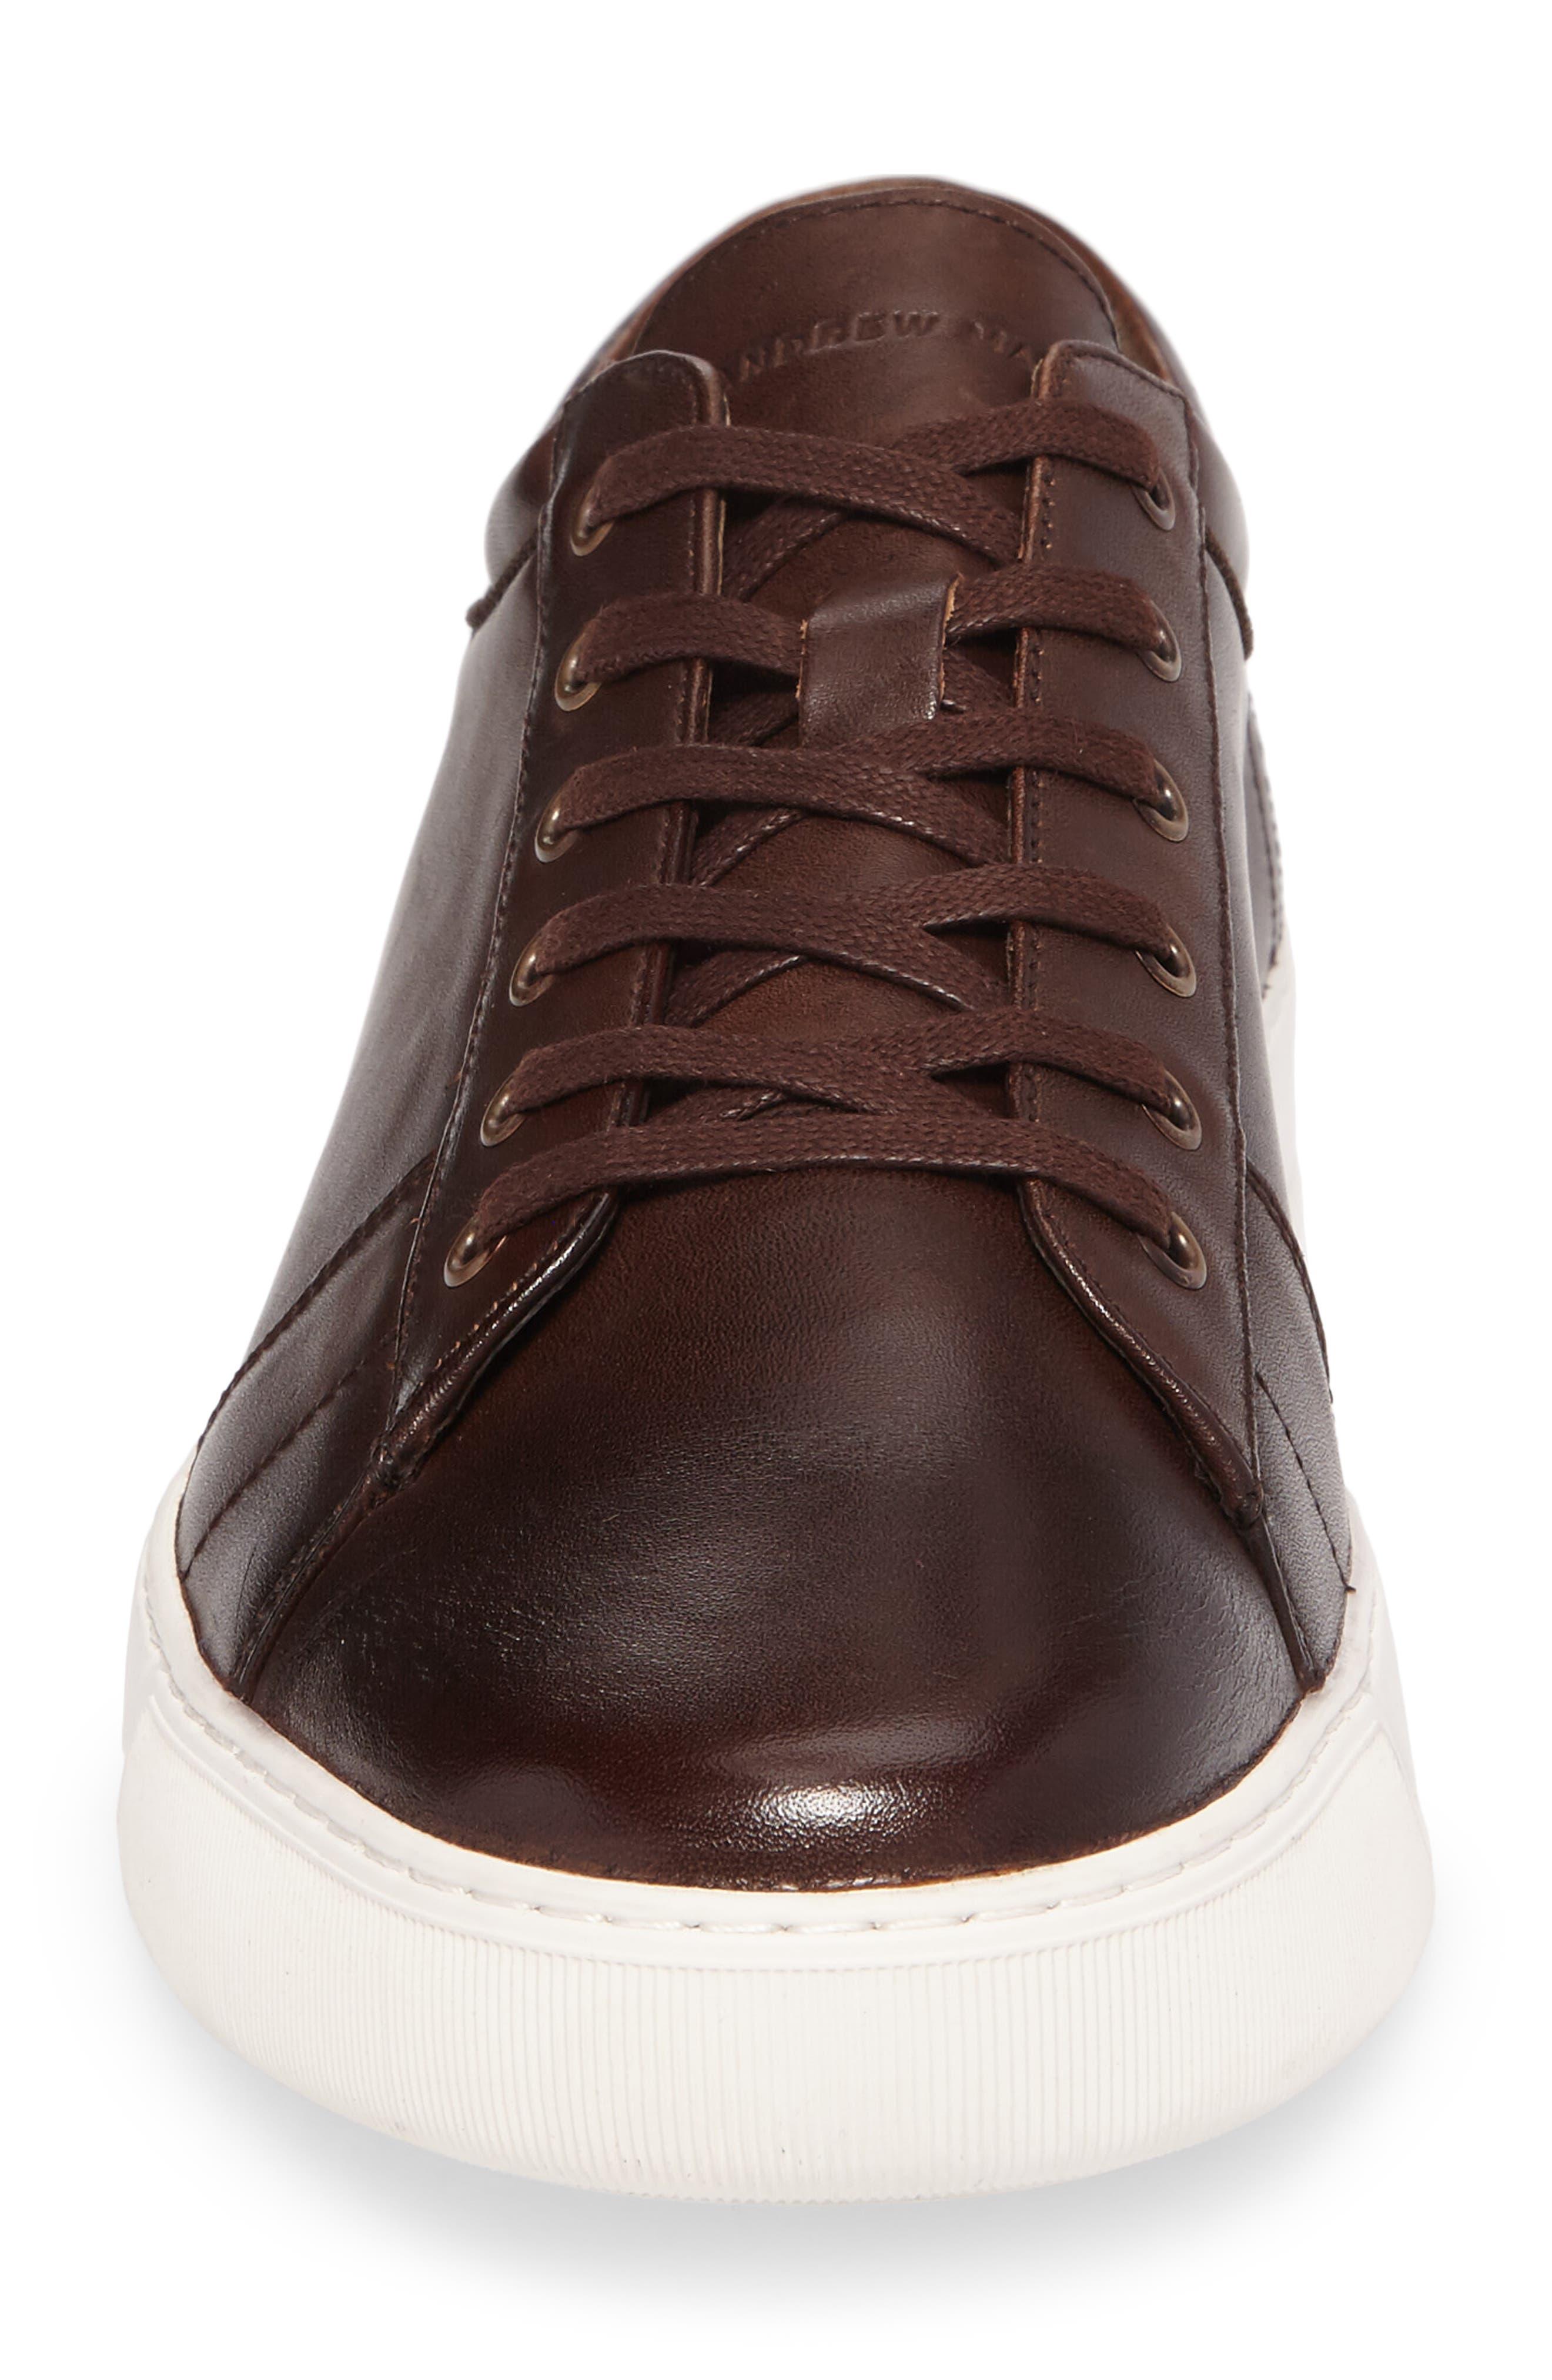 'Darwood' Sneaker,                             Alternate thumbnail 5, color,                             Dark Brown/ White Leather